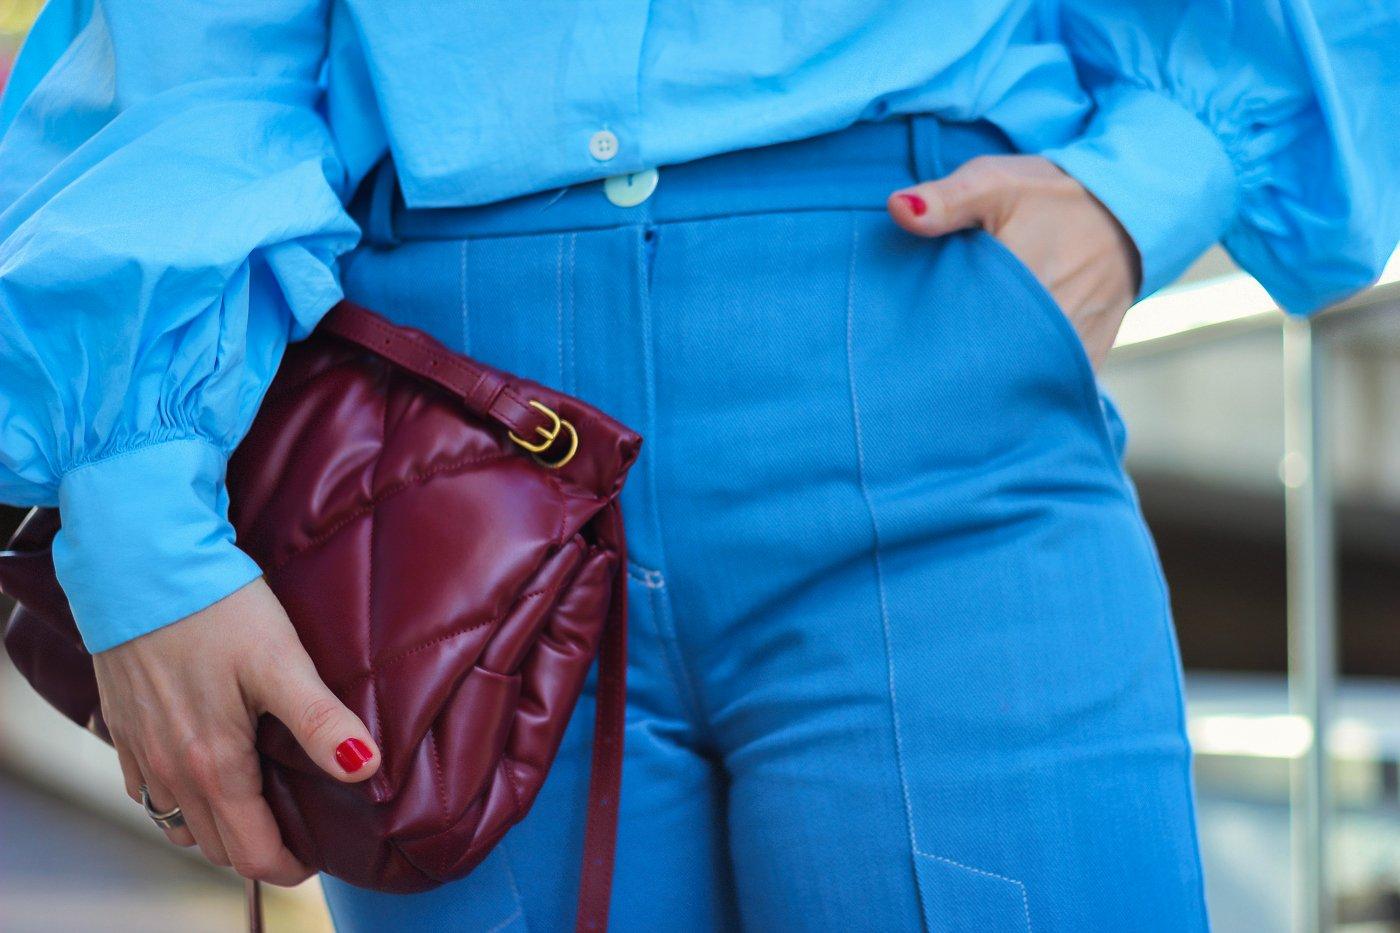 conny doll lifestyle: blaue Hose und blaue Bluse, Details, rote Tasche, Balenciaga